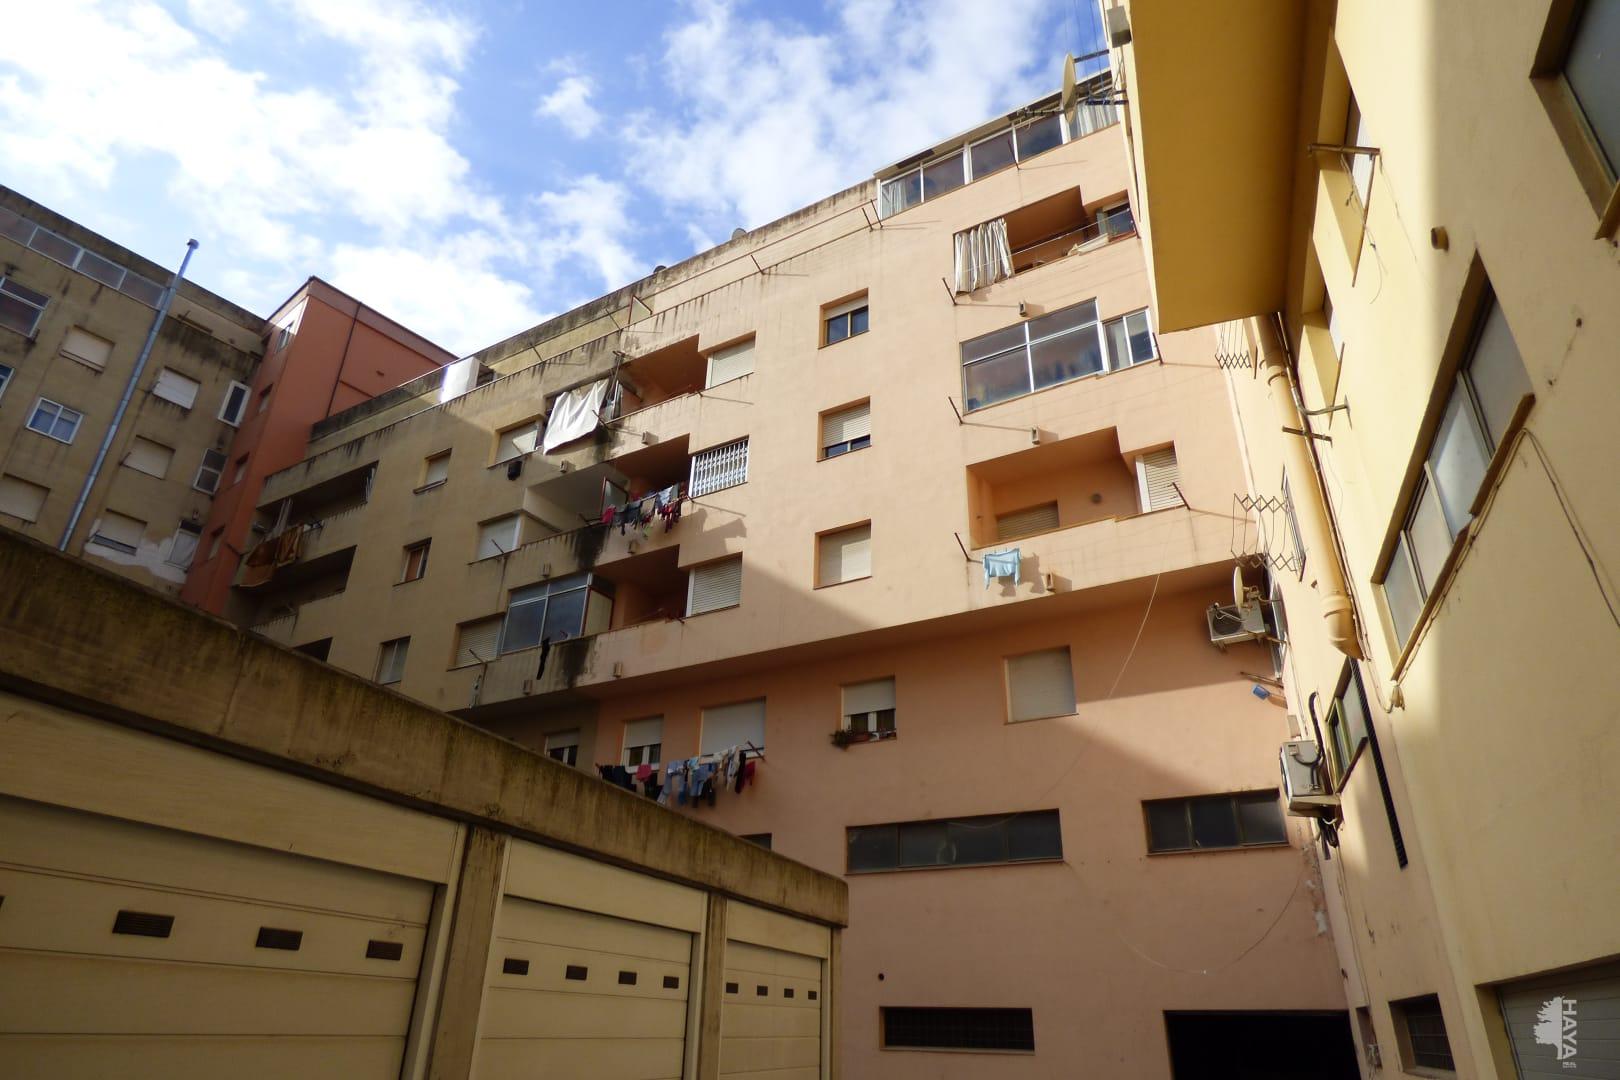 Piso en venta en Salt, Girona, Calle Anselm Clave, 51.598 €, 3 habitaciones, 1 baño, 74 m2